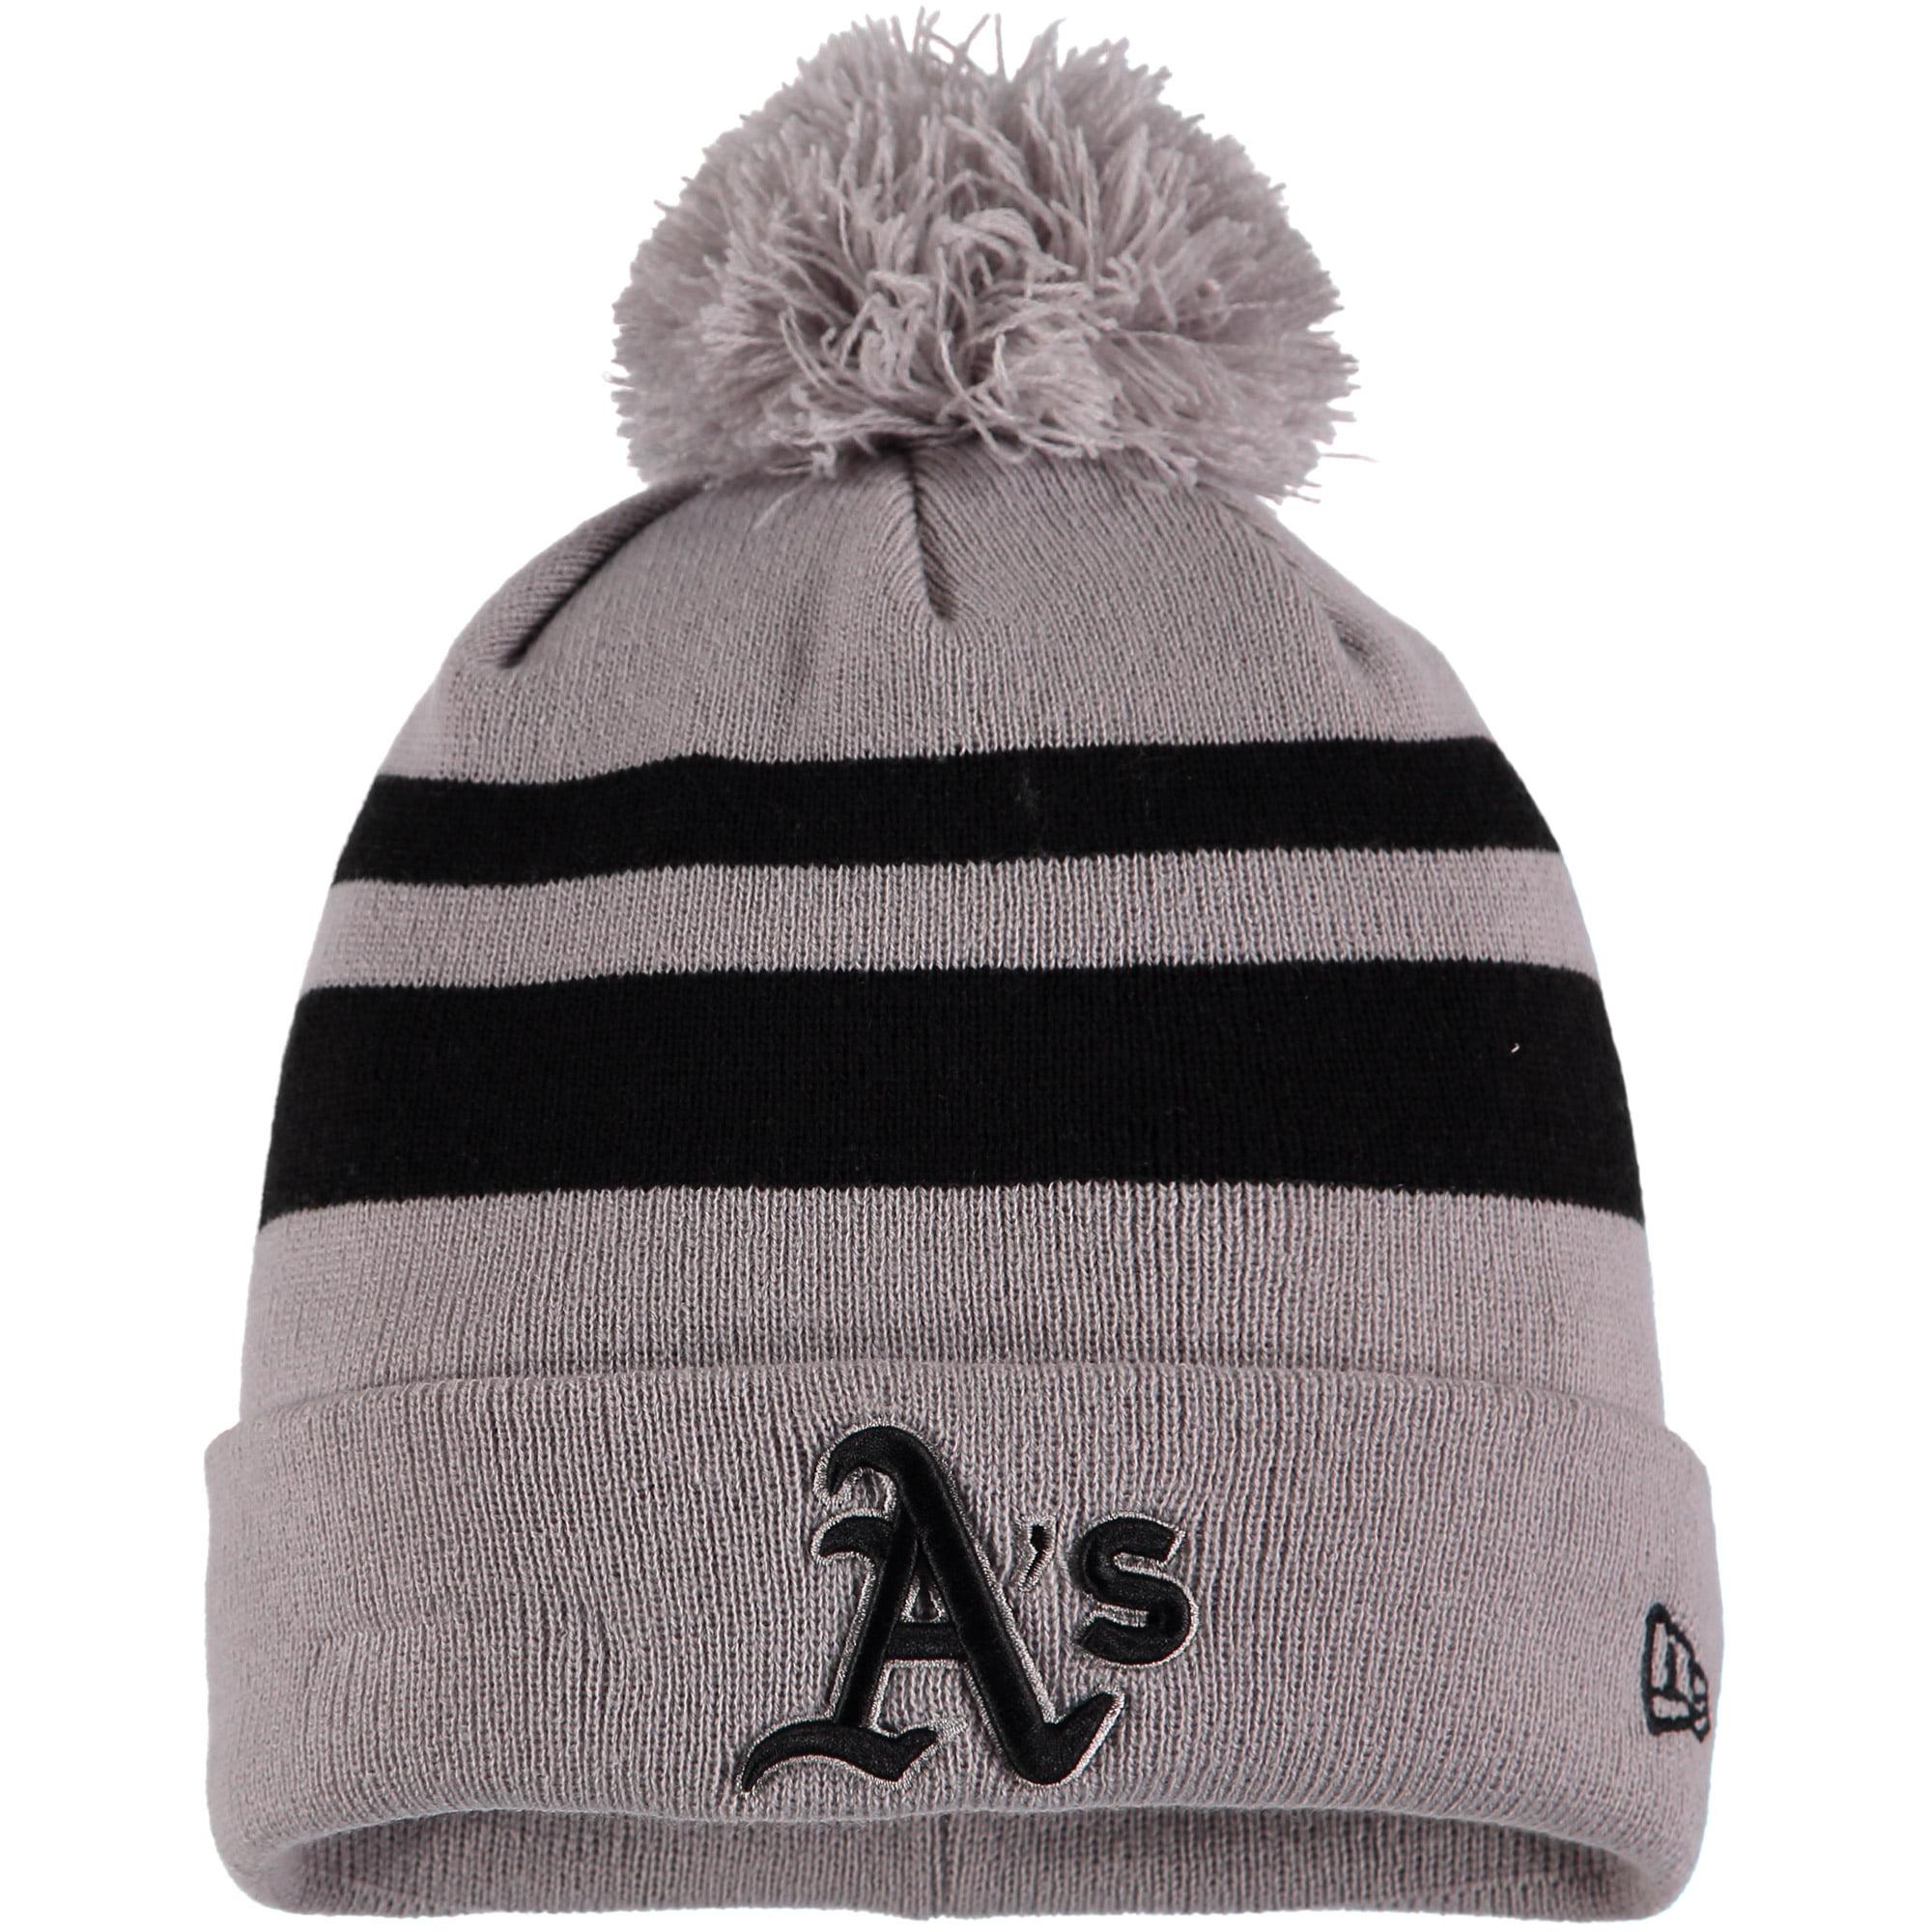 Oakland Athletics New Era Rebound Cuffed Knit Hat with Pom - Gray/Black - OSFA